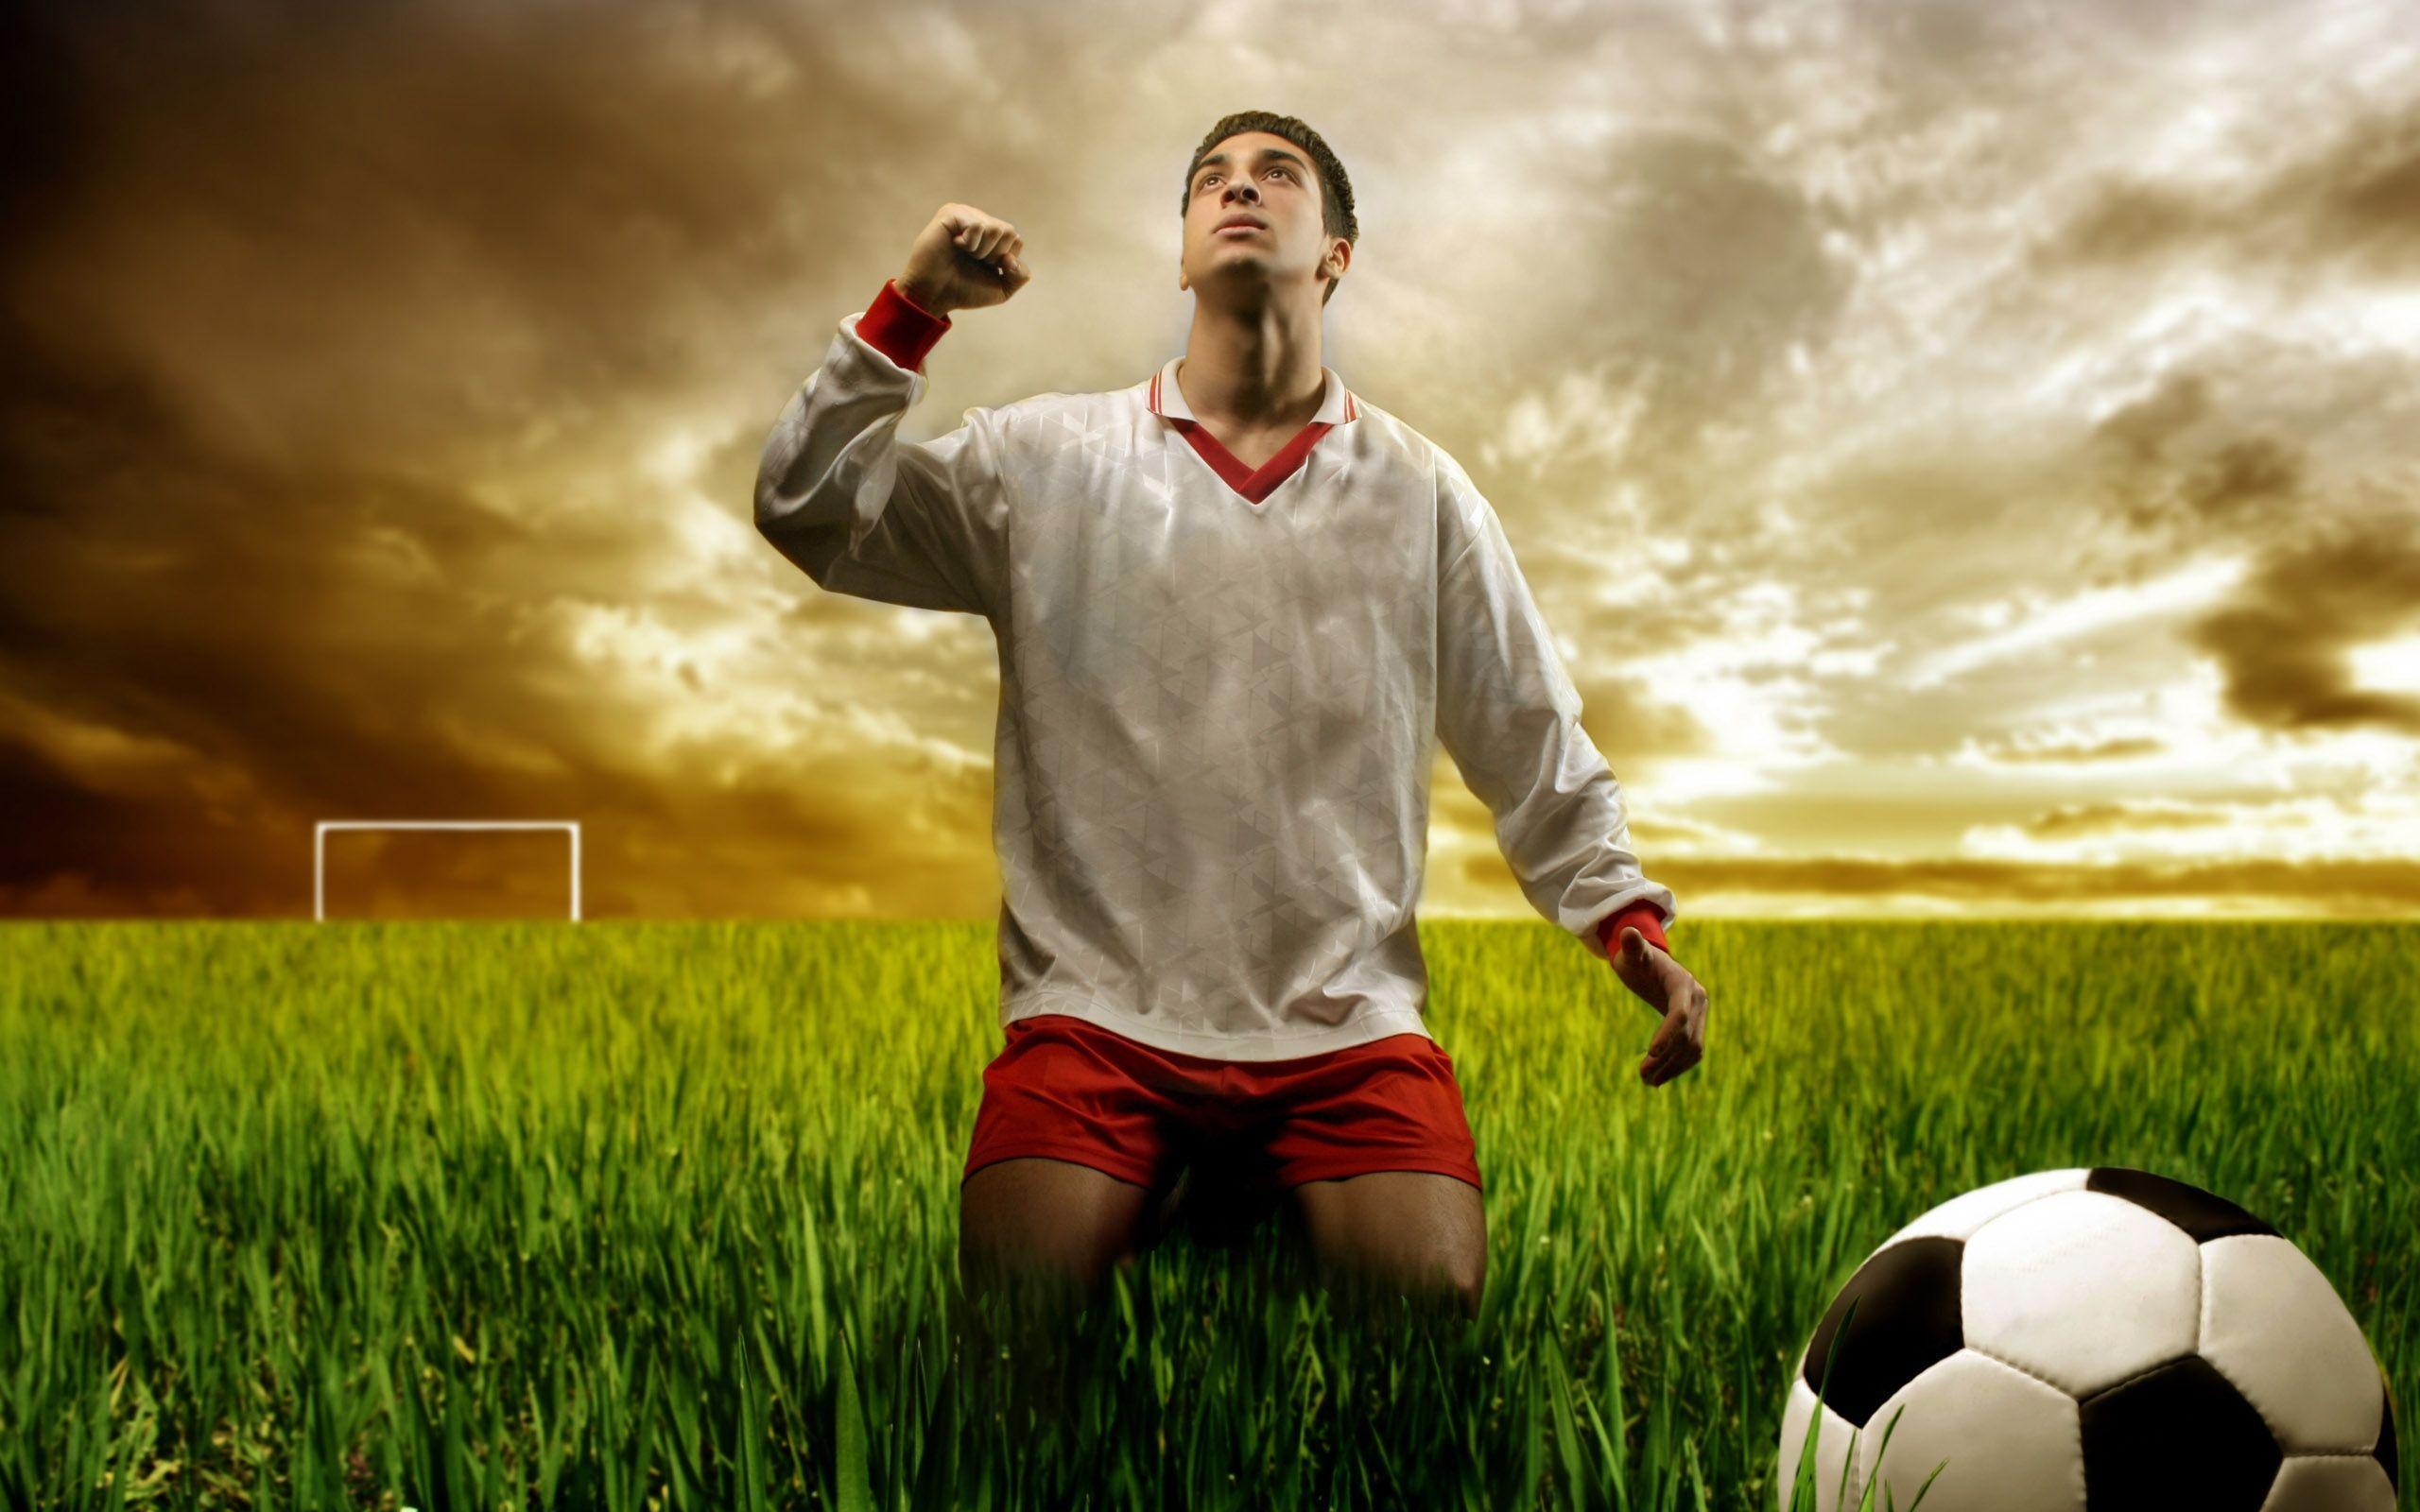 Cool Soccer Desktop Wallpapers Top Free Cool Soccer Desktop Backgrounds Wallpaperaccess